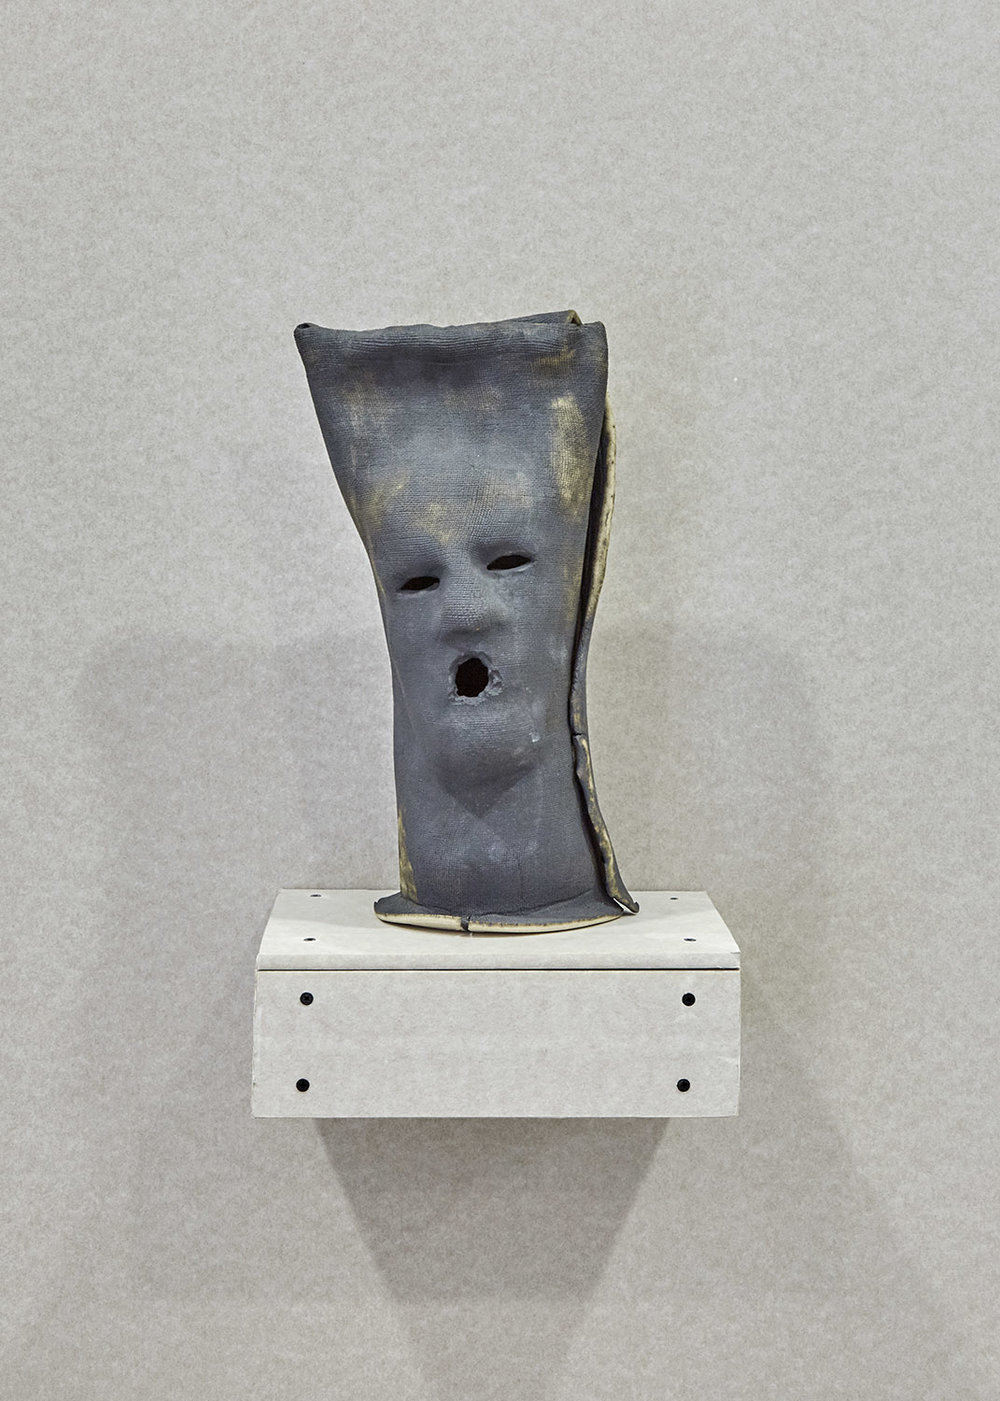 Jonathan Baldock Sack Mask Oxidised Iron Stoneware 45 x 25 x 25cm, 2017